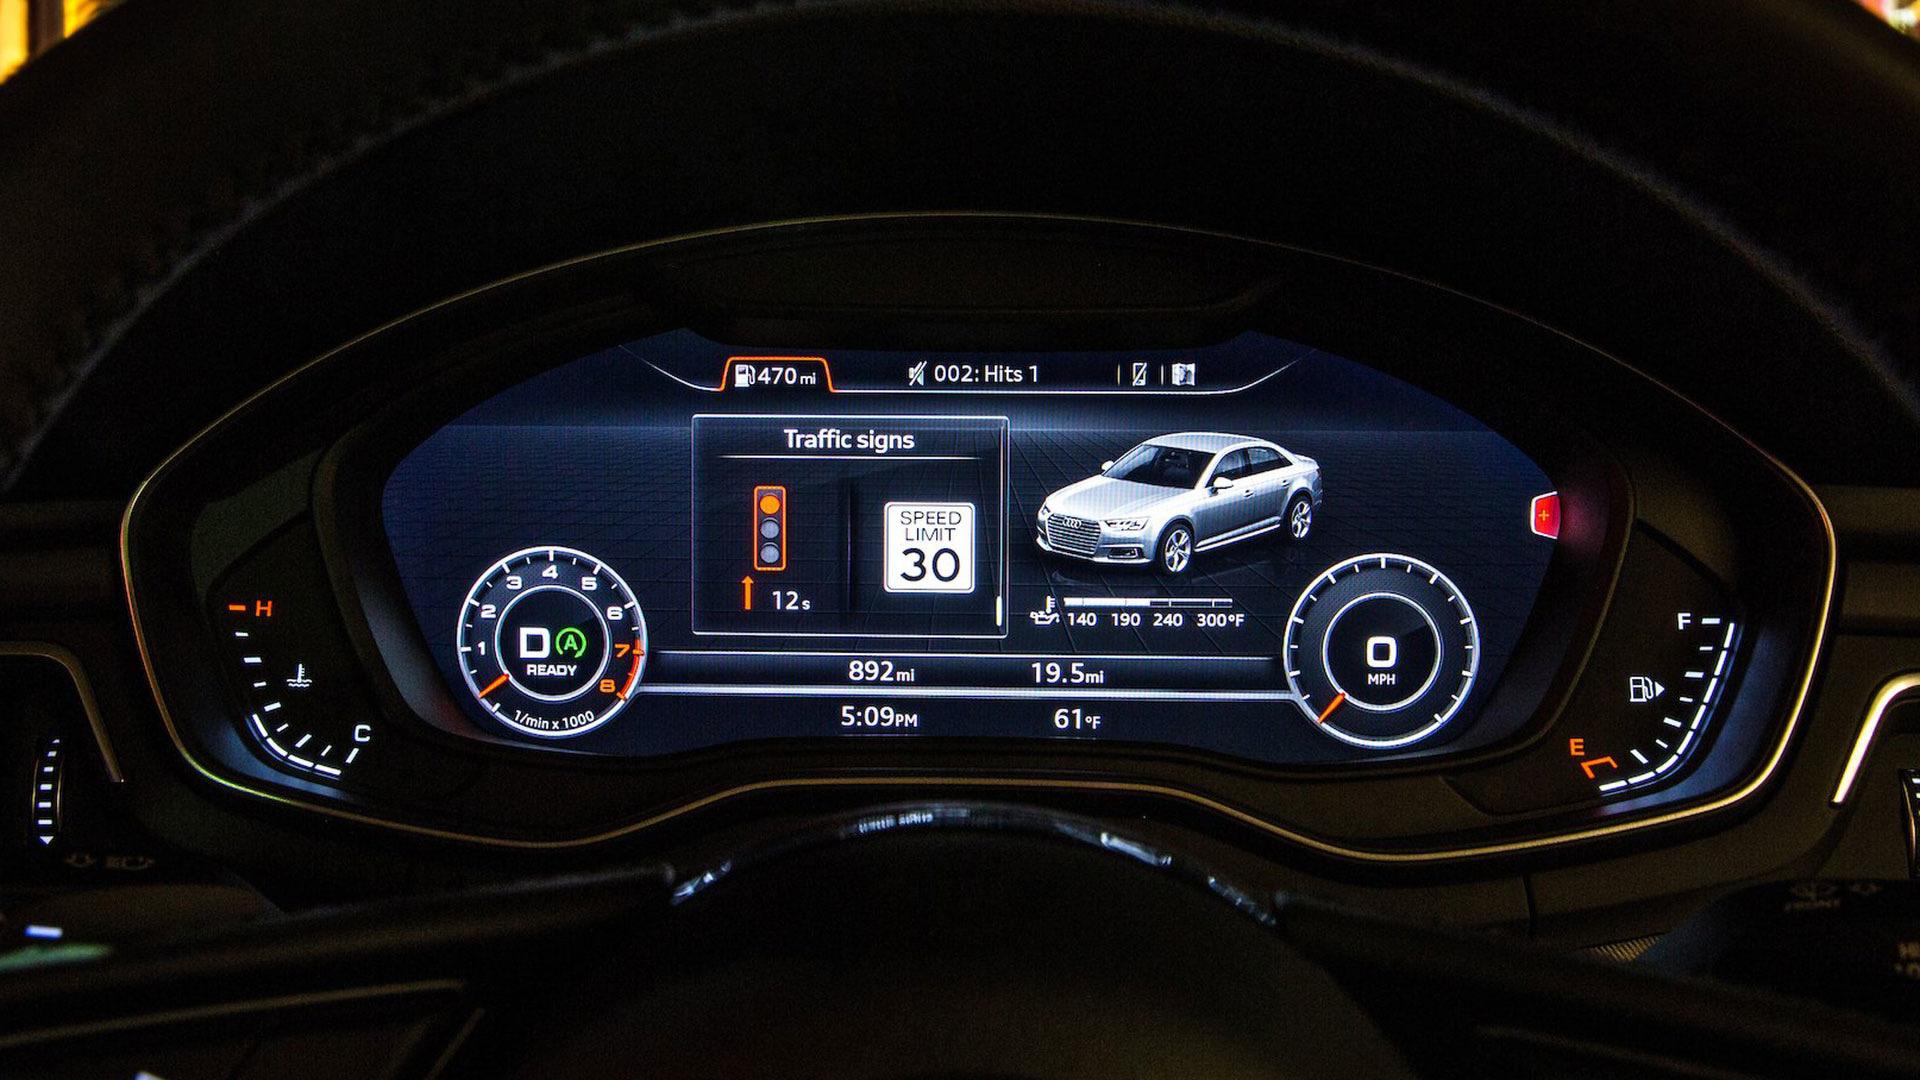 Audi traffic light